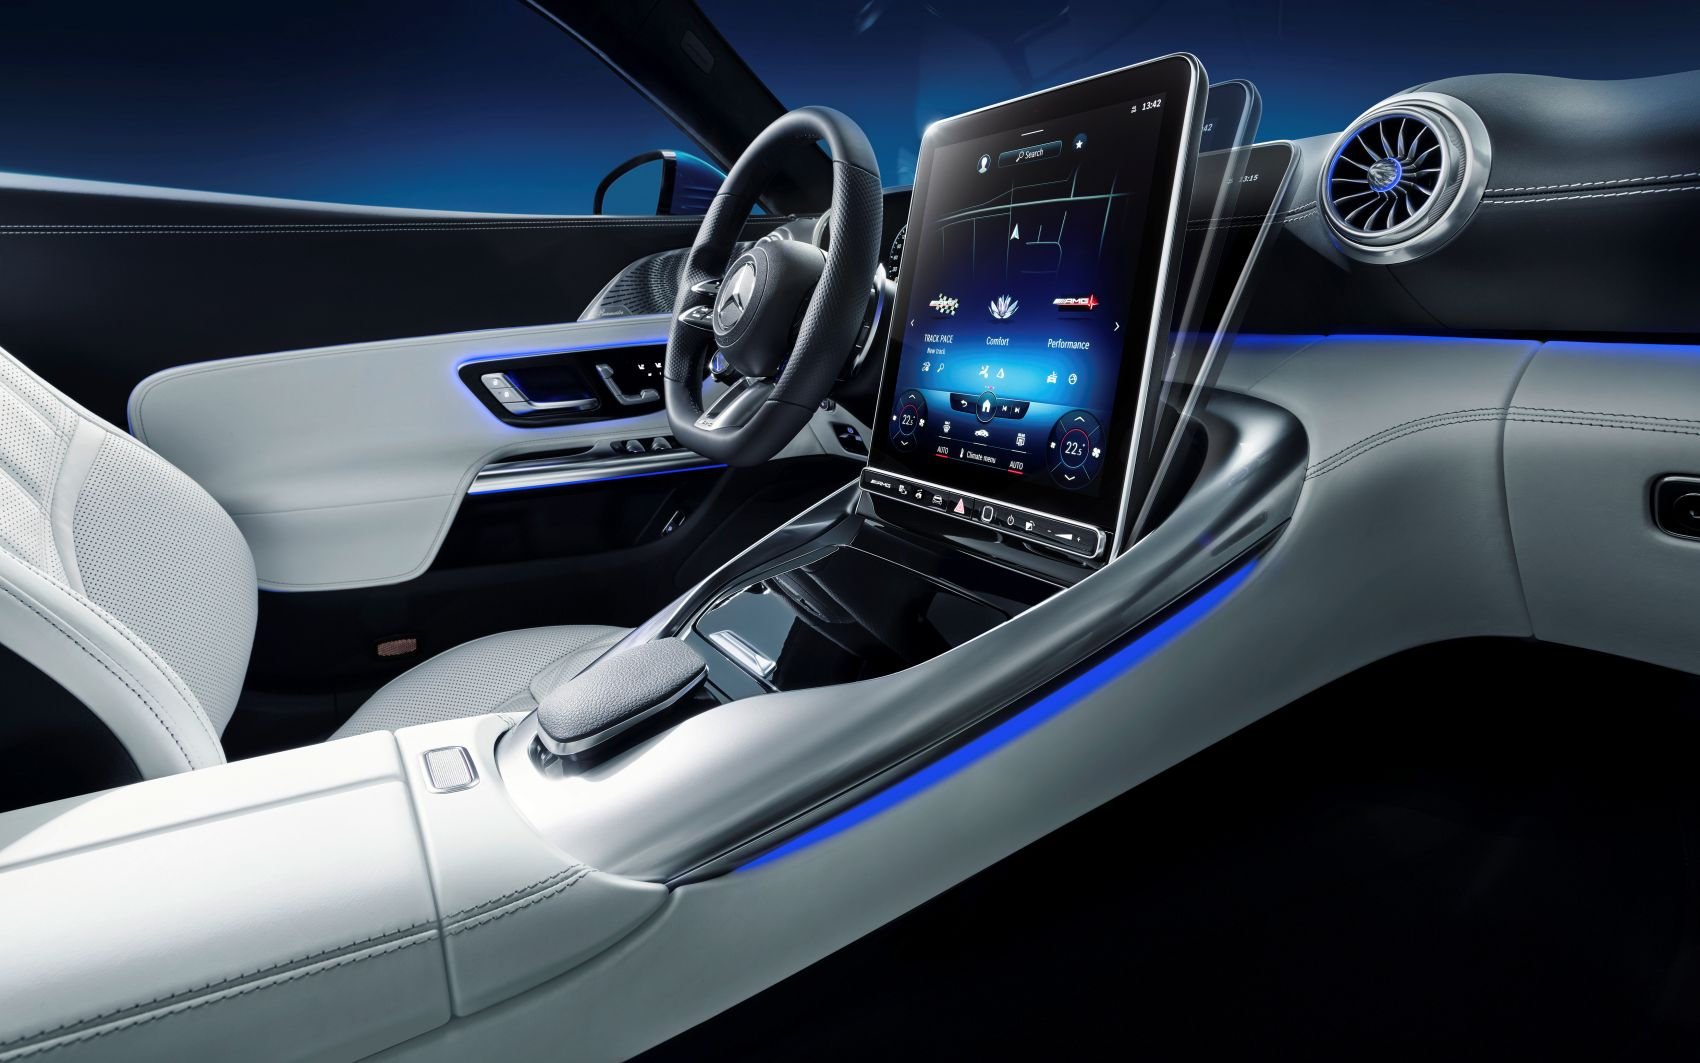 Mercedes SL R232 Interieur MBUX